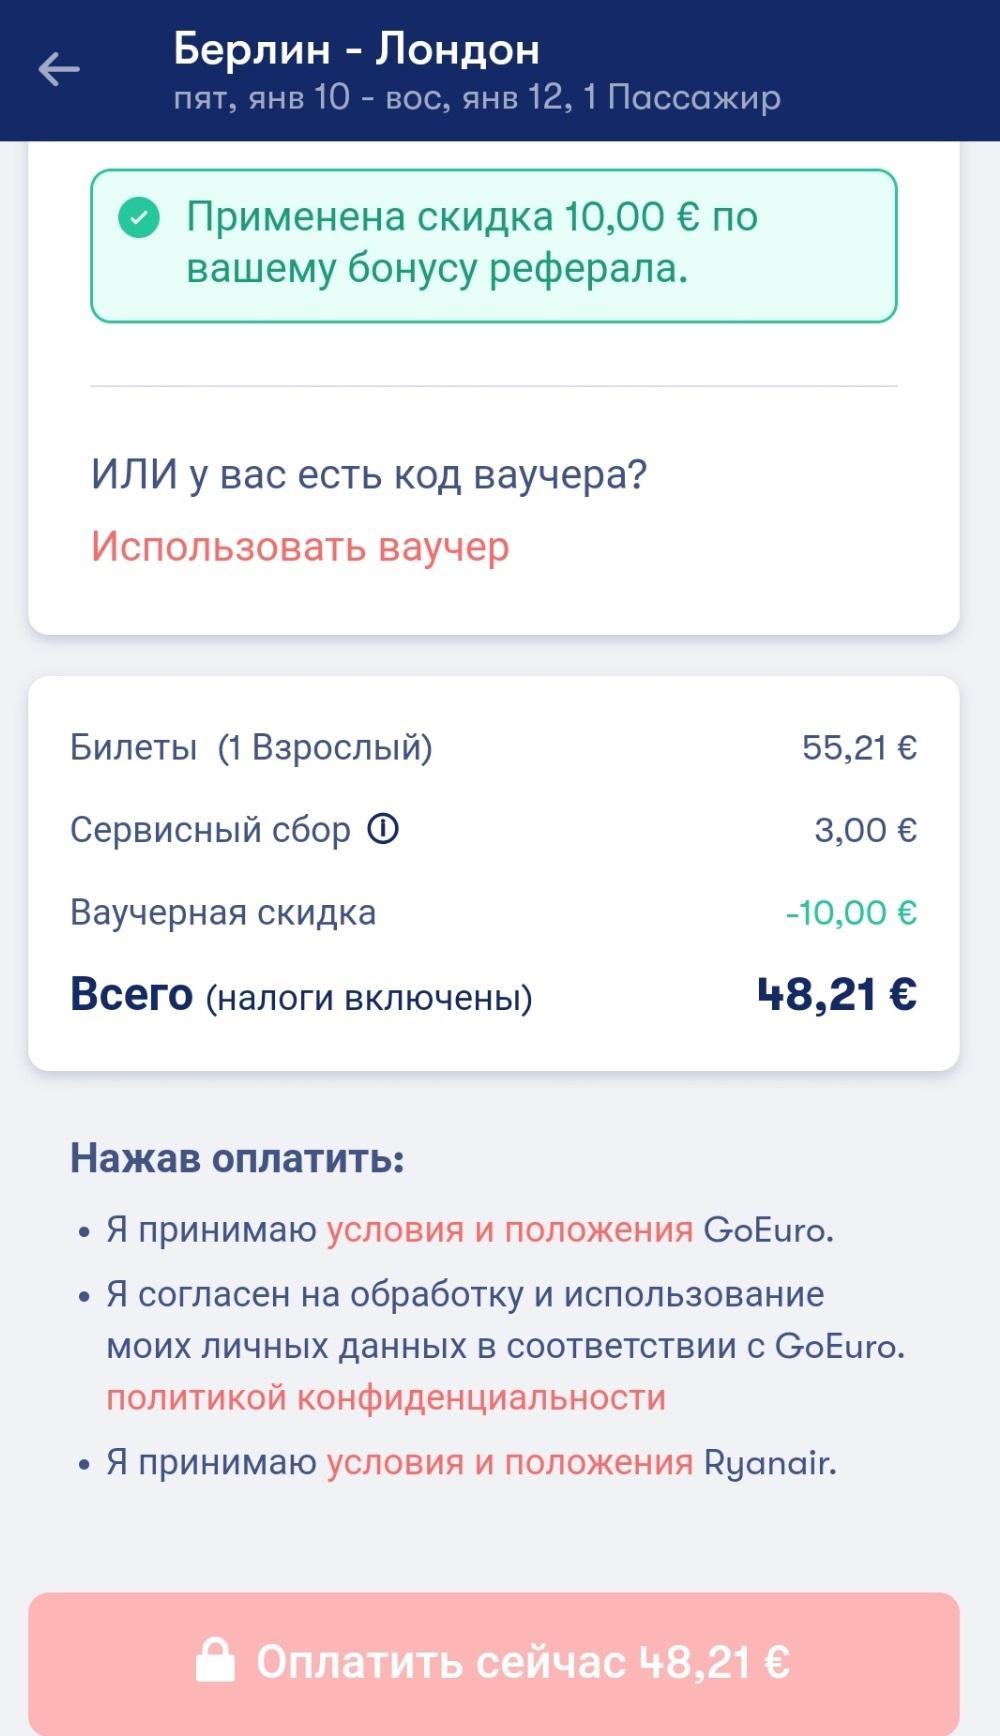 ryanair coupon easyjet